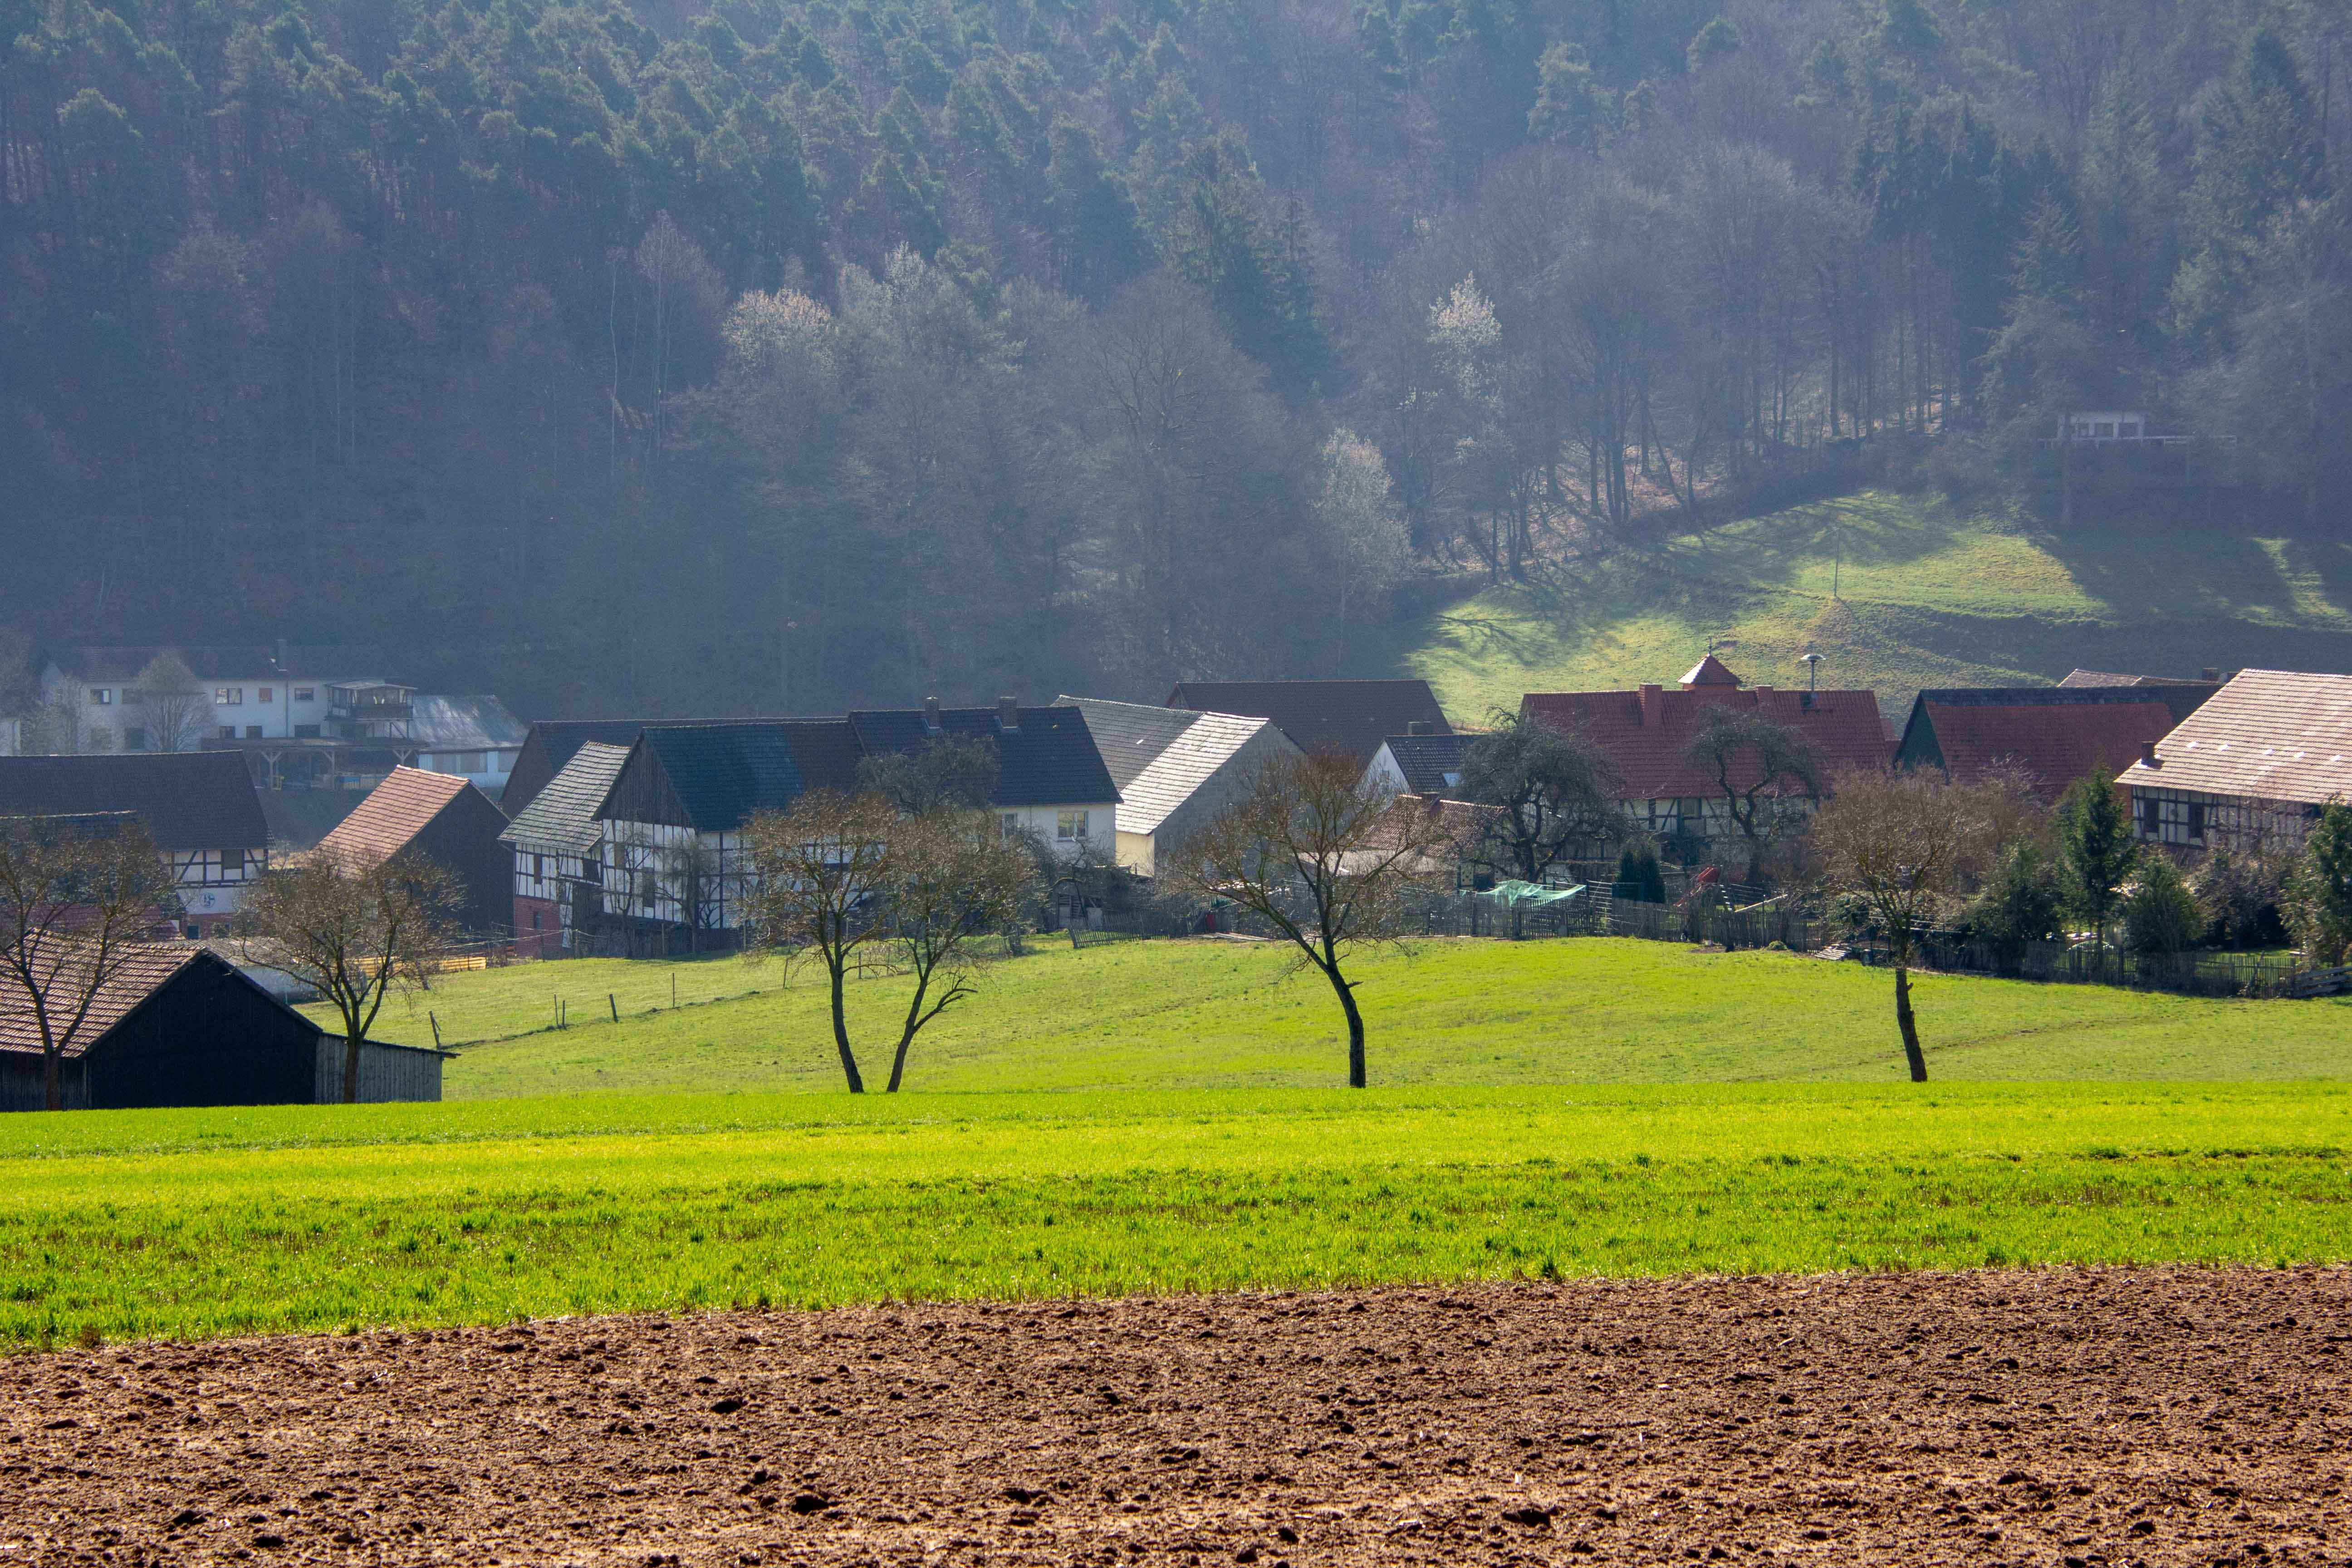 Frühlingsimpressionen um Gershausen 2019